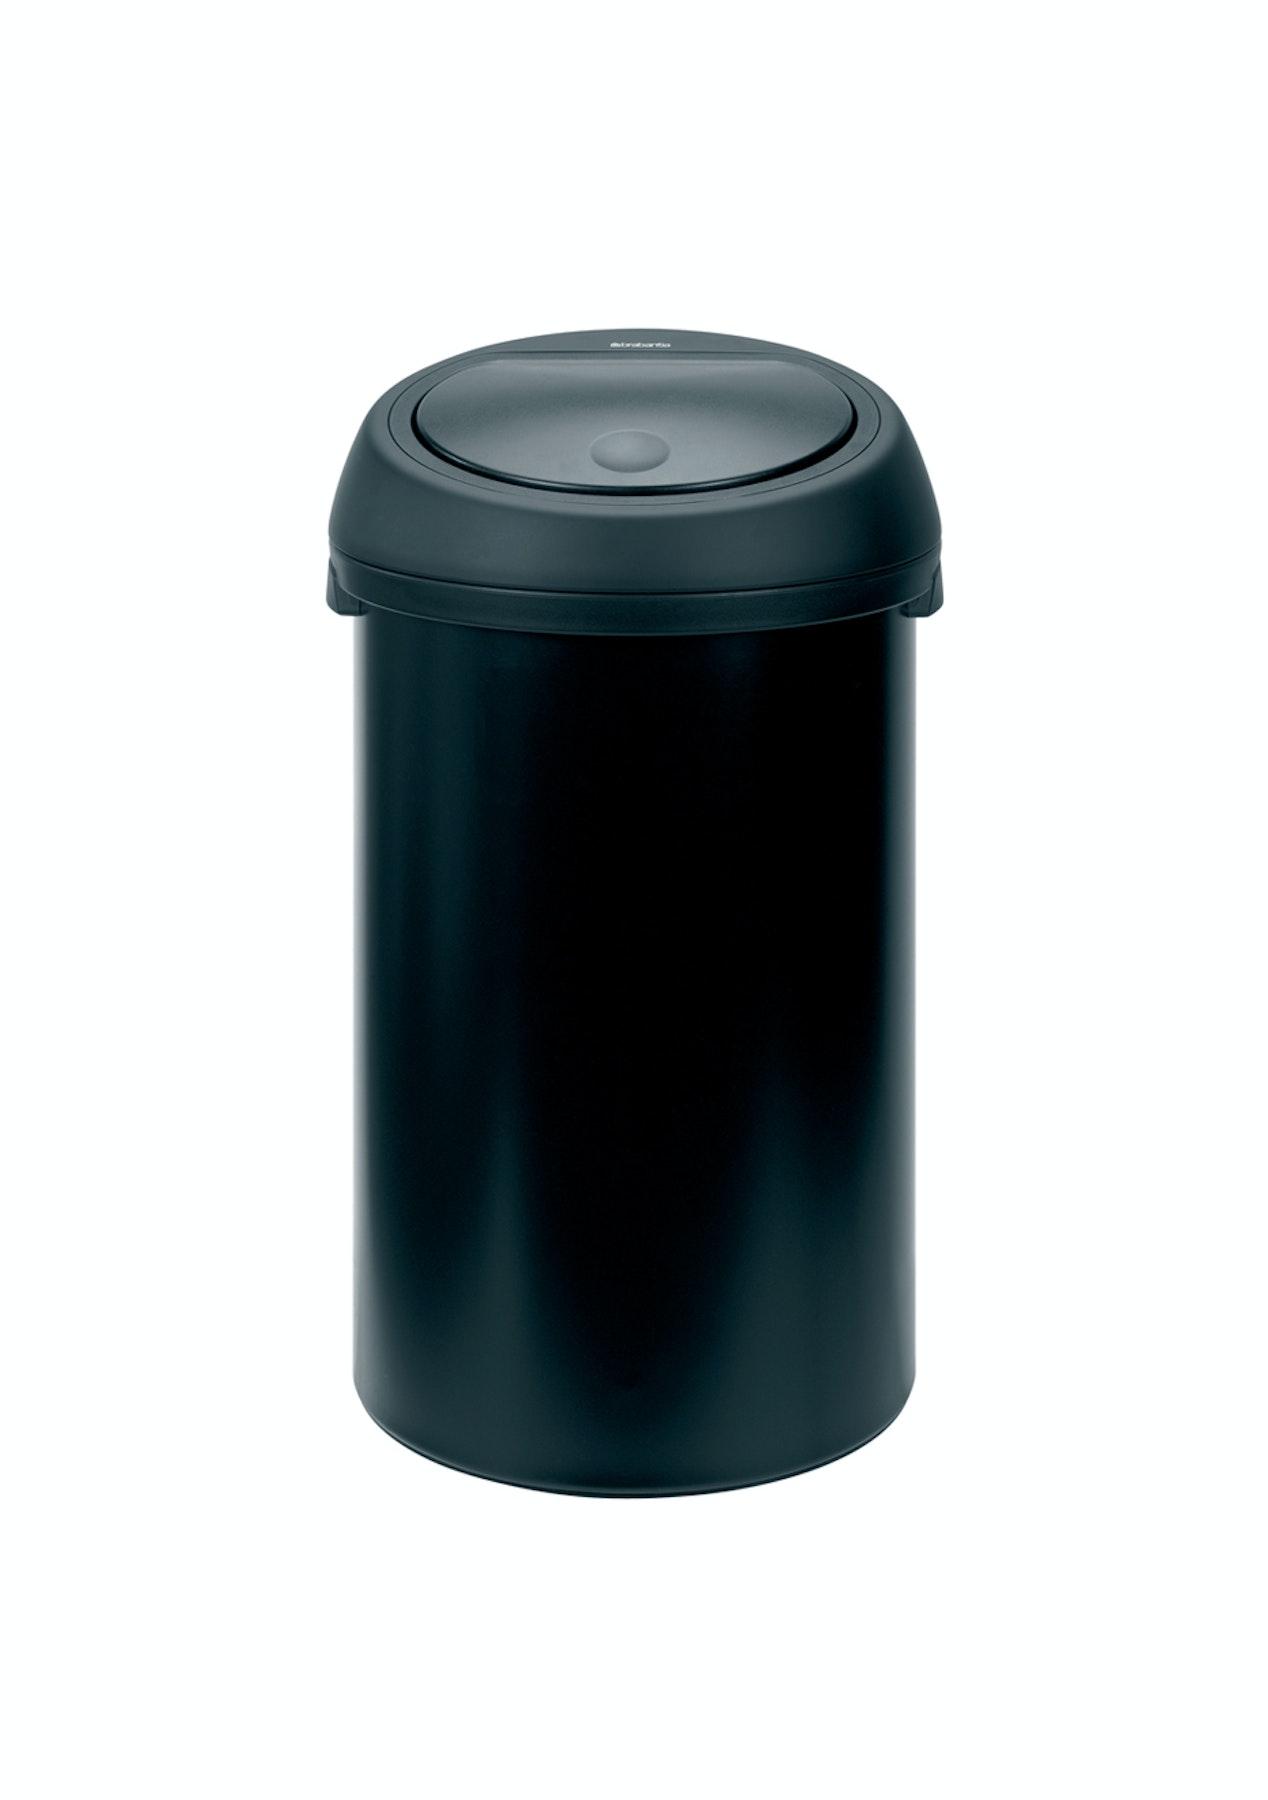 Brabantia Touch Bin 50 Liter Wit.Brabantia Rd Touch Bin 50l Matt Black W Black Lid